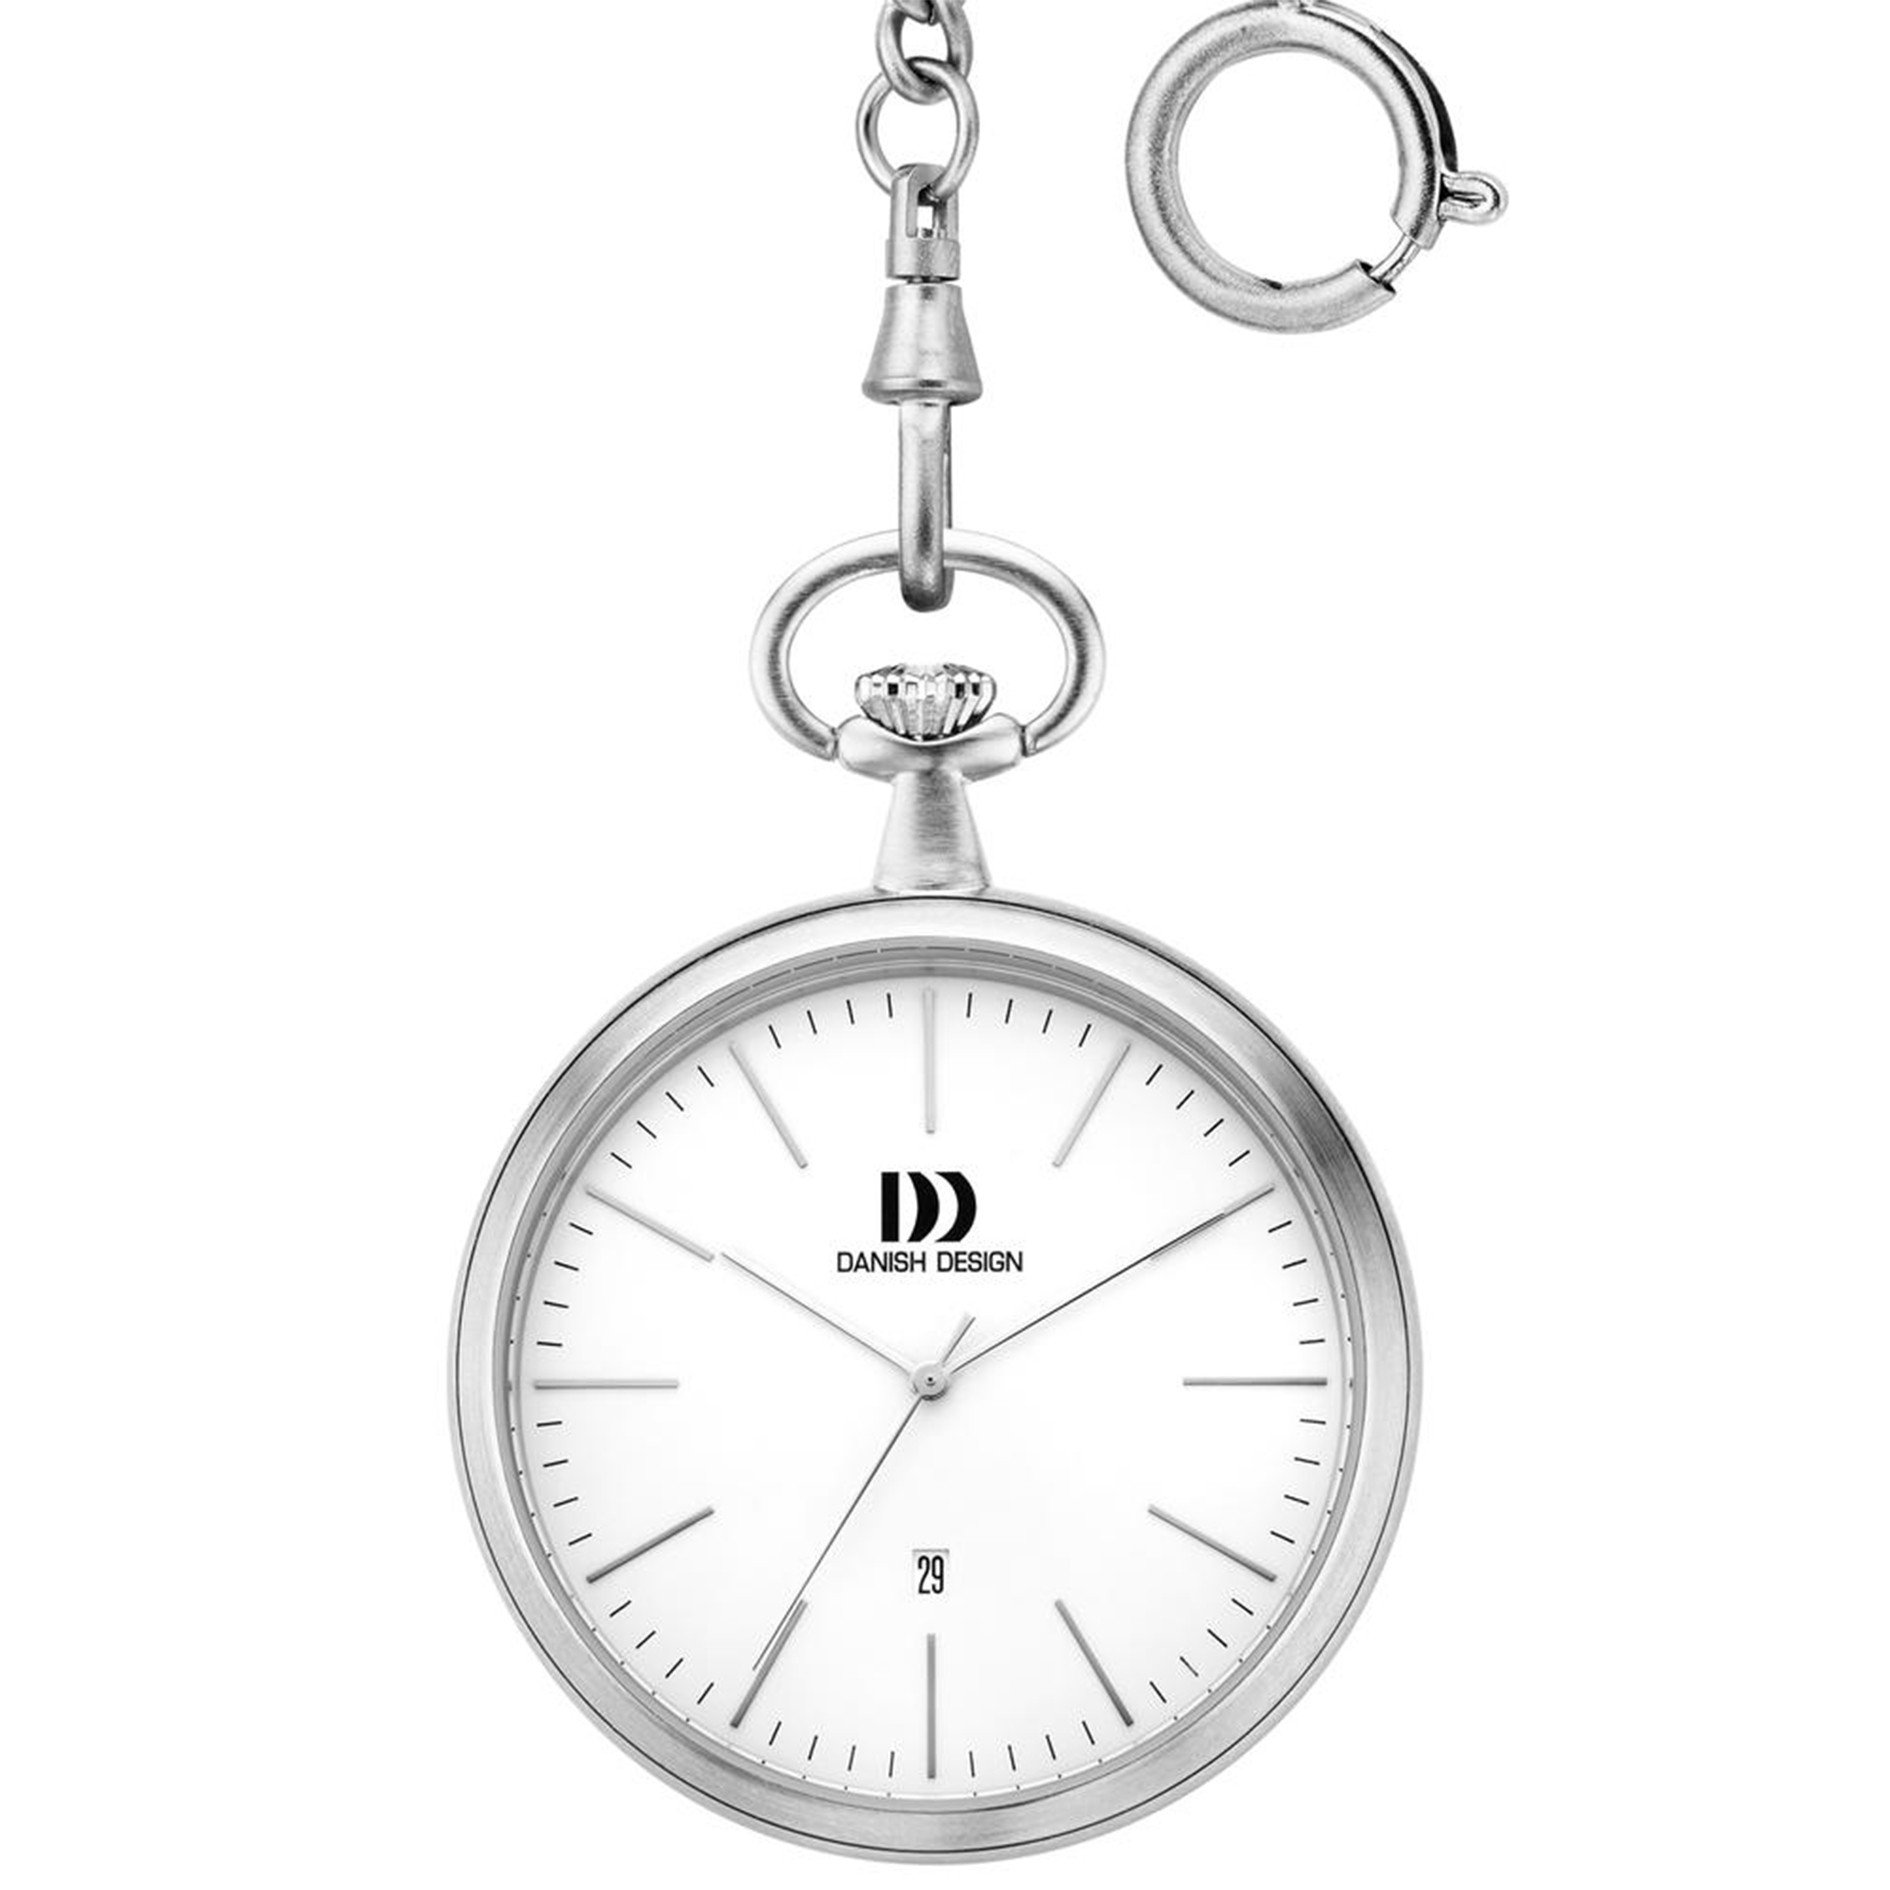 1890x1890 Stainless Steel Pocket Watch Polkadot Gallery